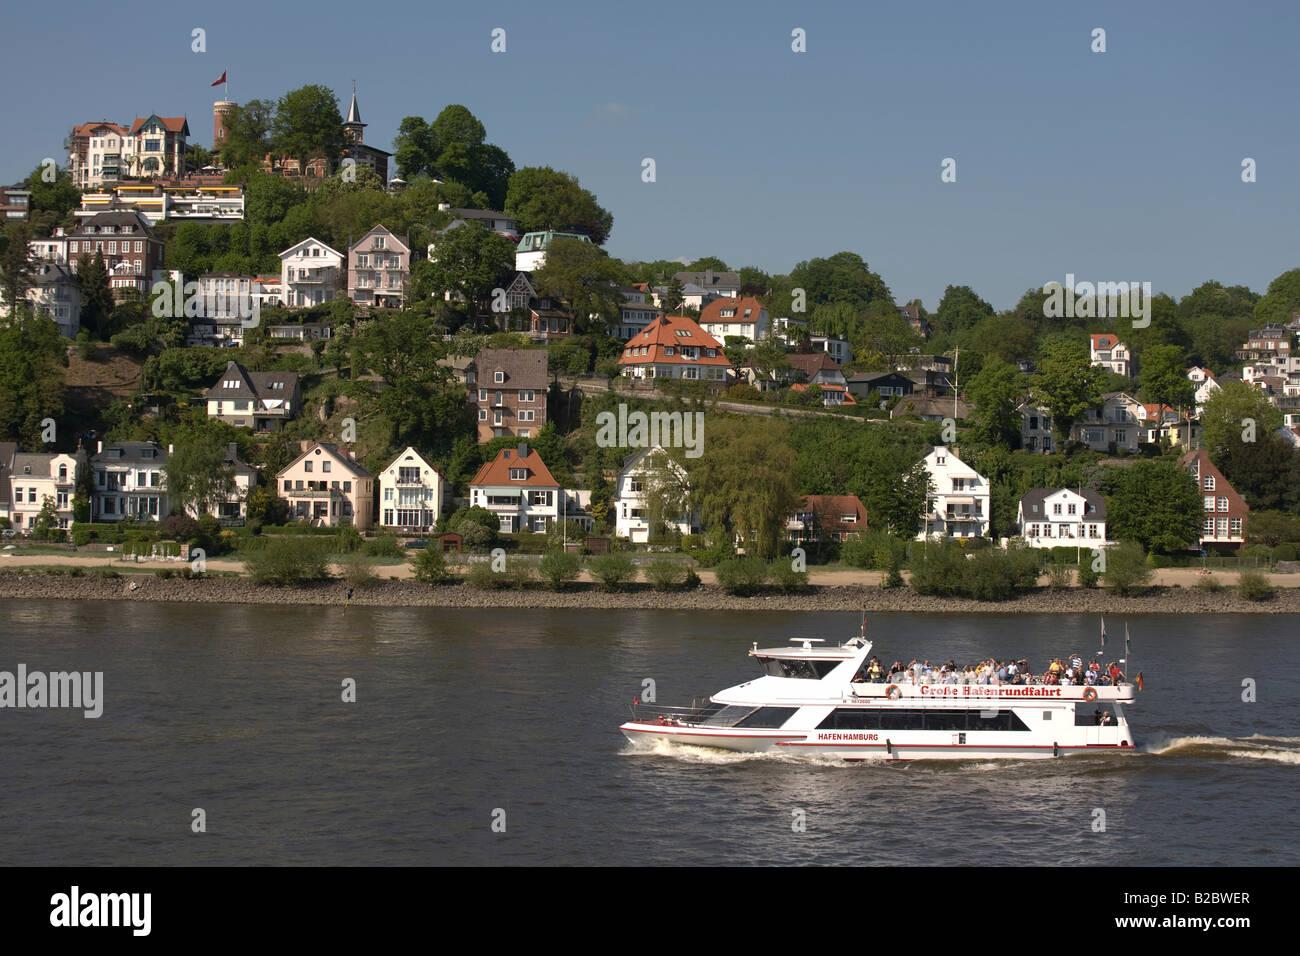 Quartier Blankenese, Elbe sophistiqués, banlieue banlieue villa, cours inférieur de l'Elbe, Elbe, Photo Stock